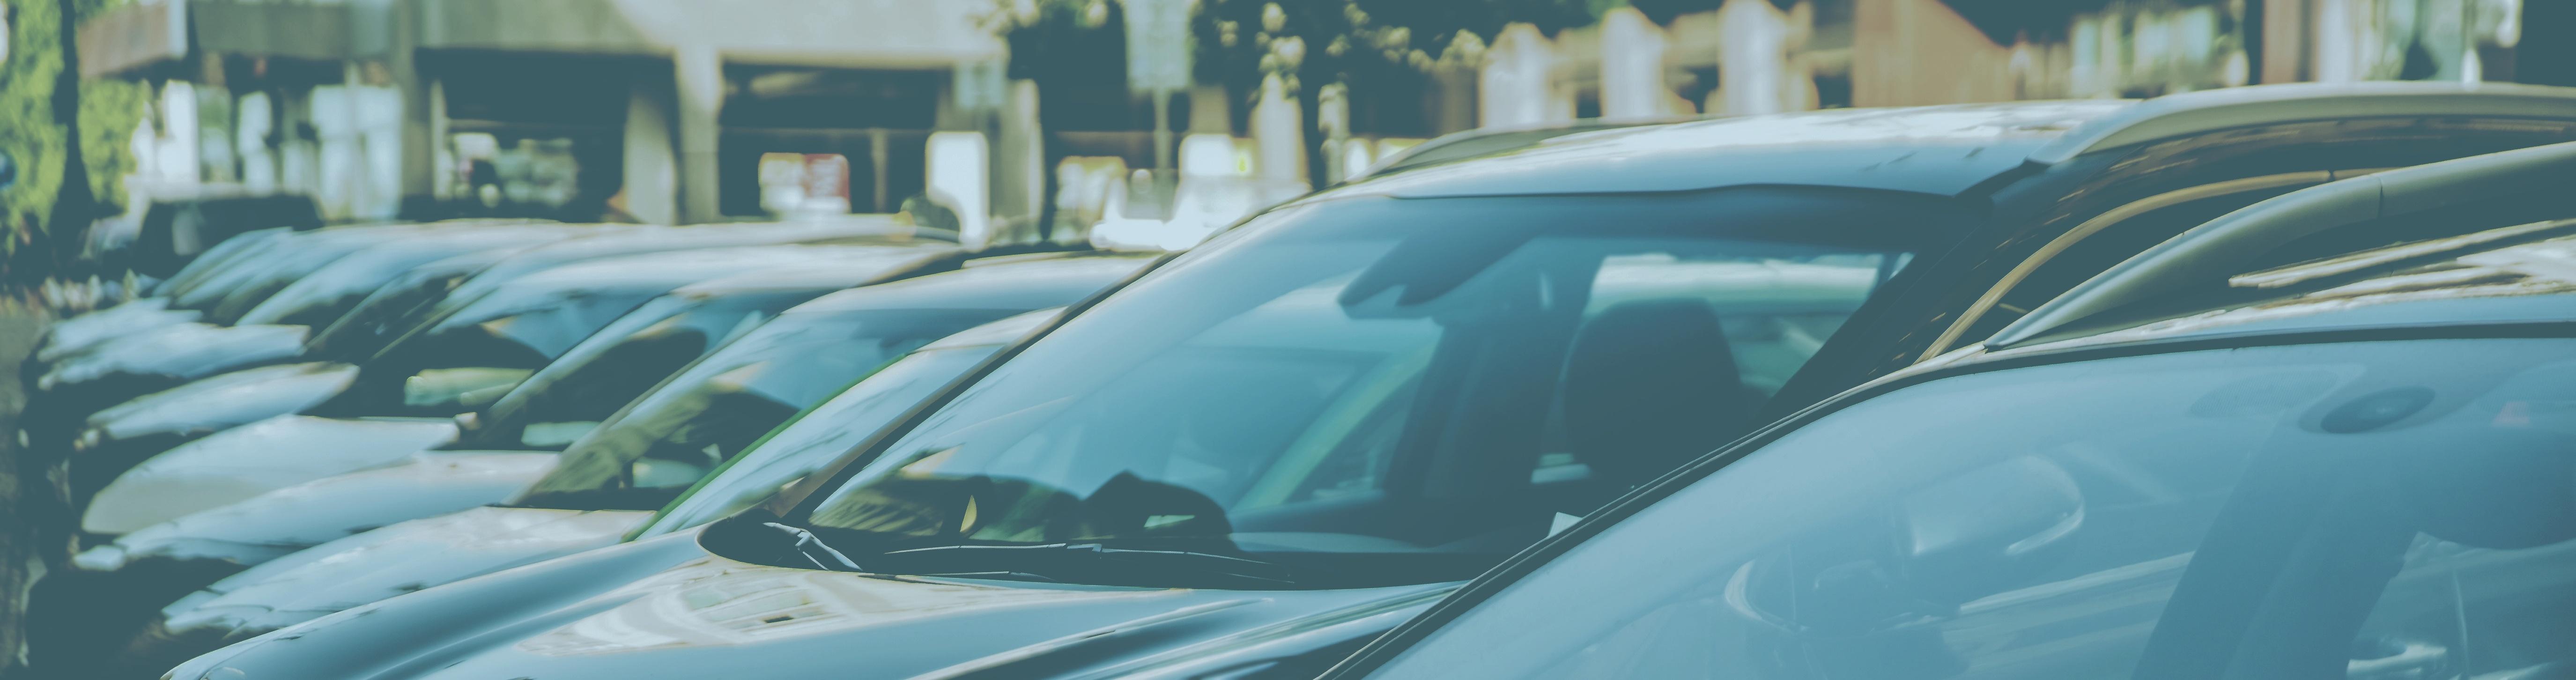 auto insurance case study-873157-edited.jpg